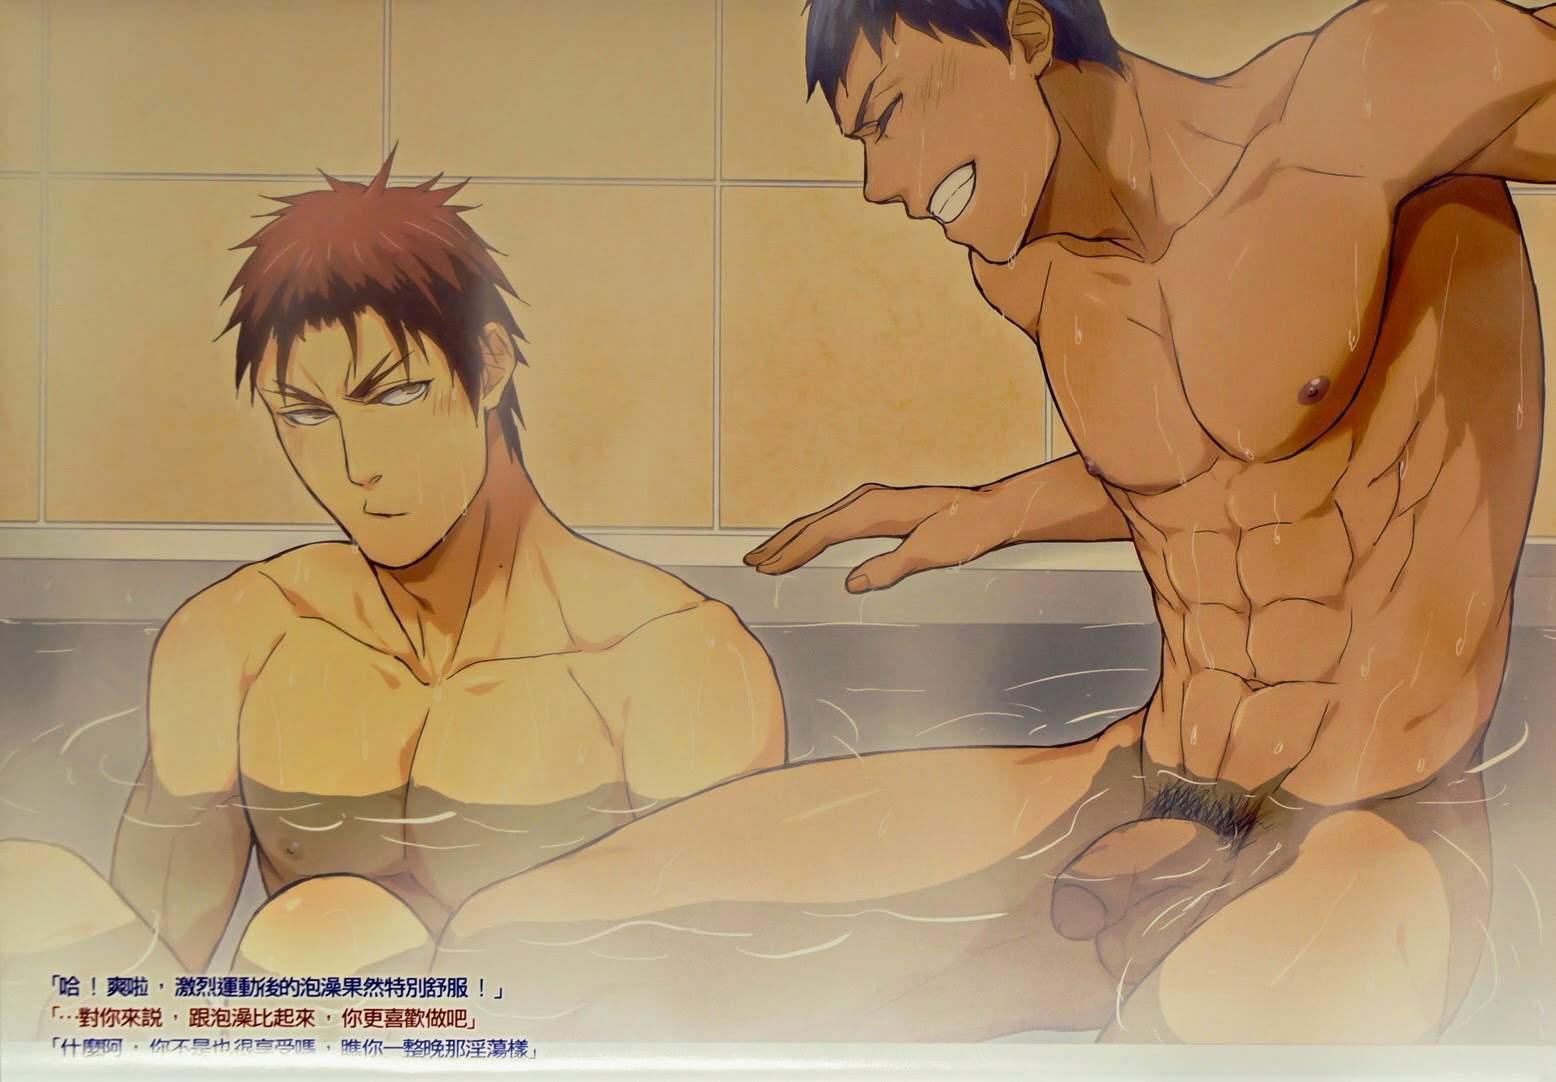 Trang 28 - Shooting Angle My! Night ver (- Zawar) - Truyện tranh Gay - Server HostedOnGoogleServerStaging